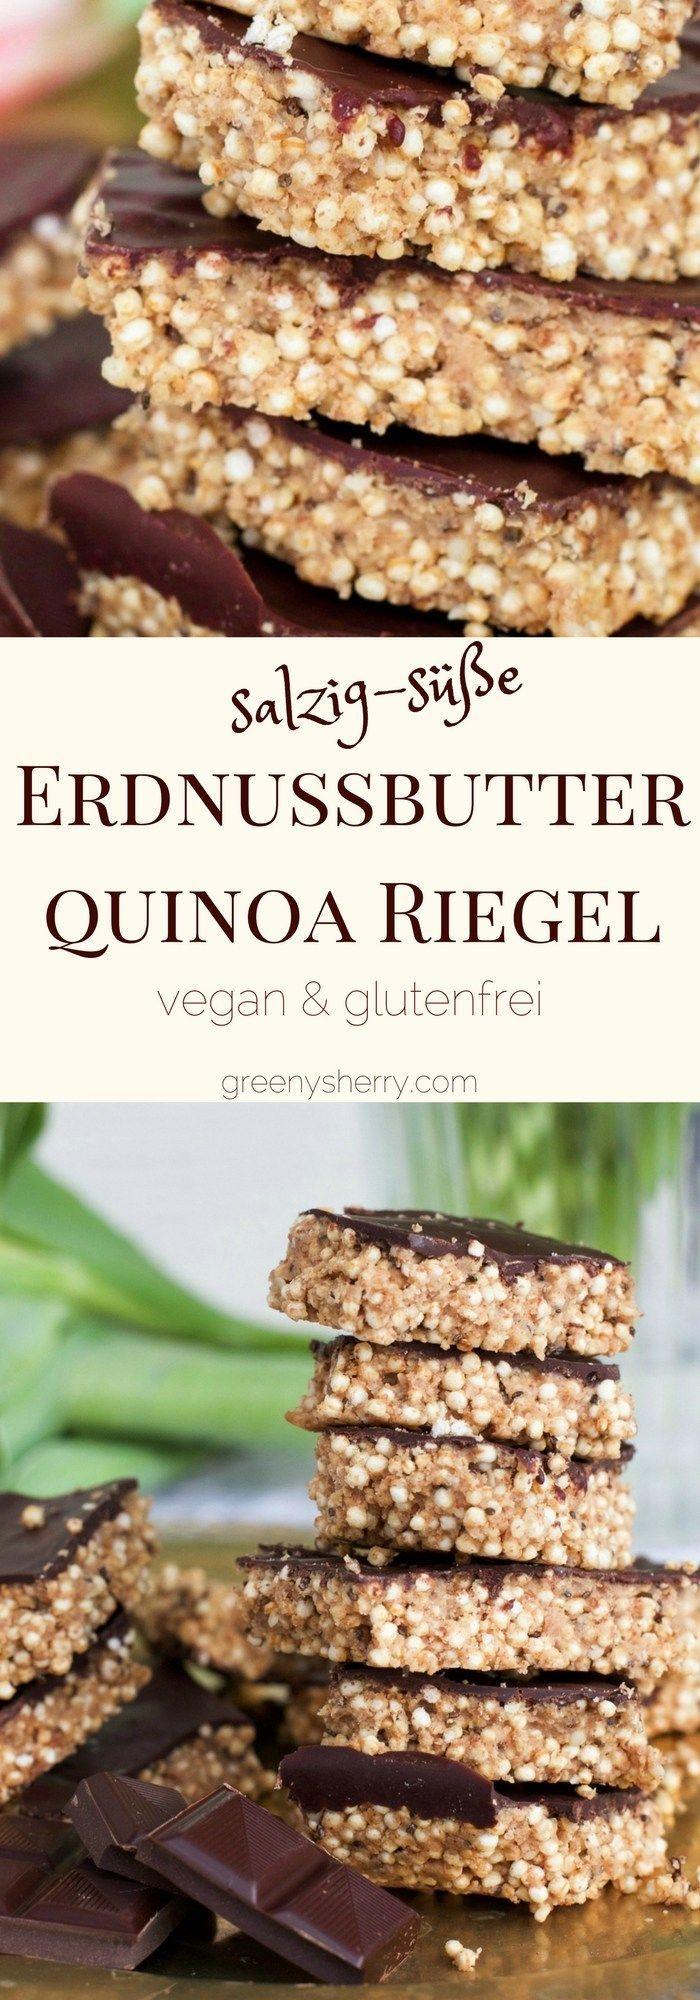 Salty-sweet peanut butter Quinoa bar with chocolate (vegan & gluten-free   - Healthy -